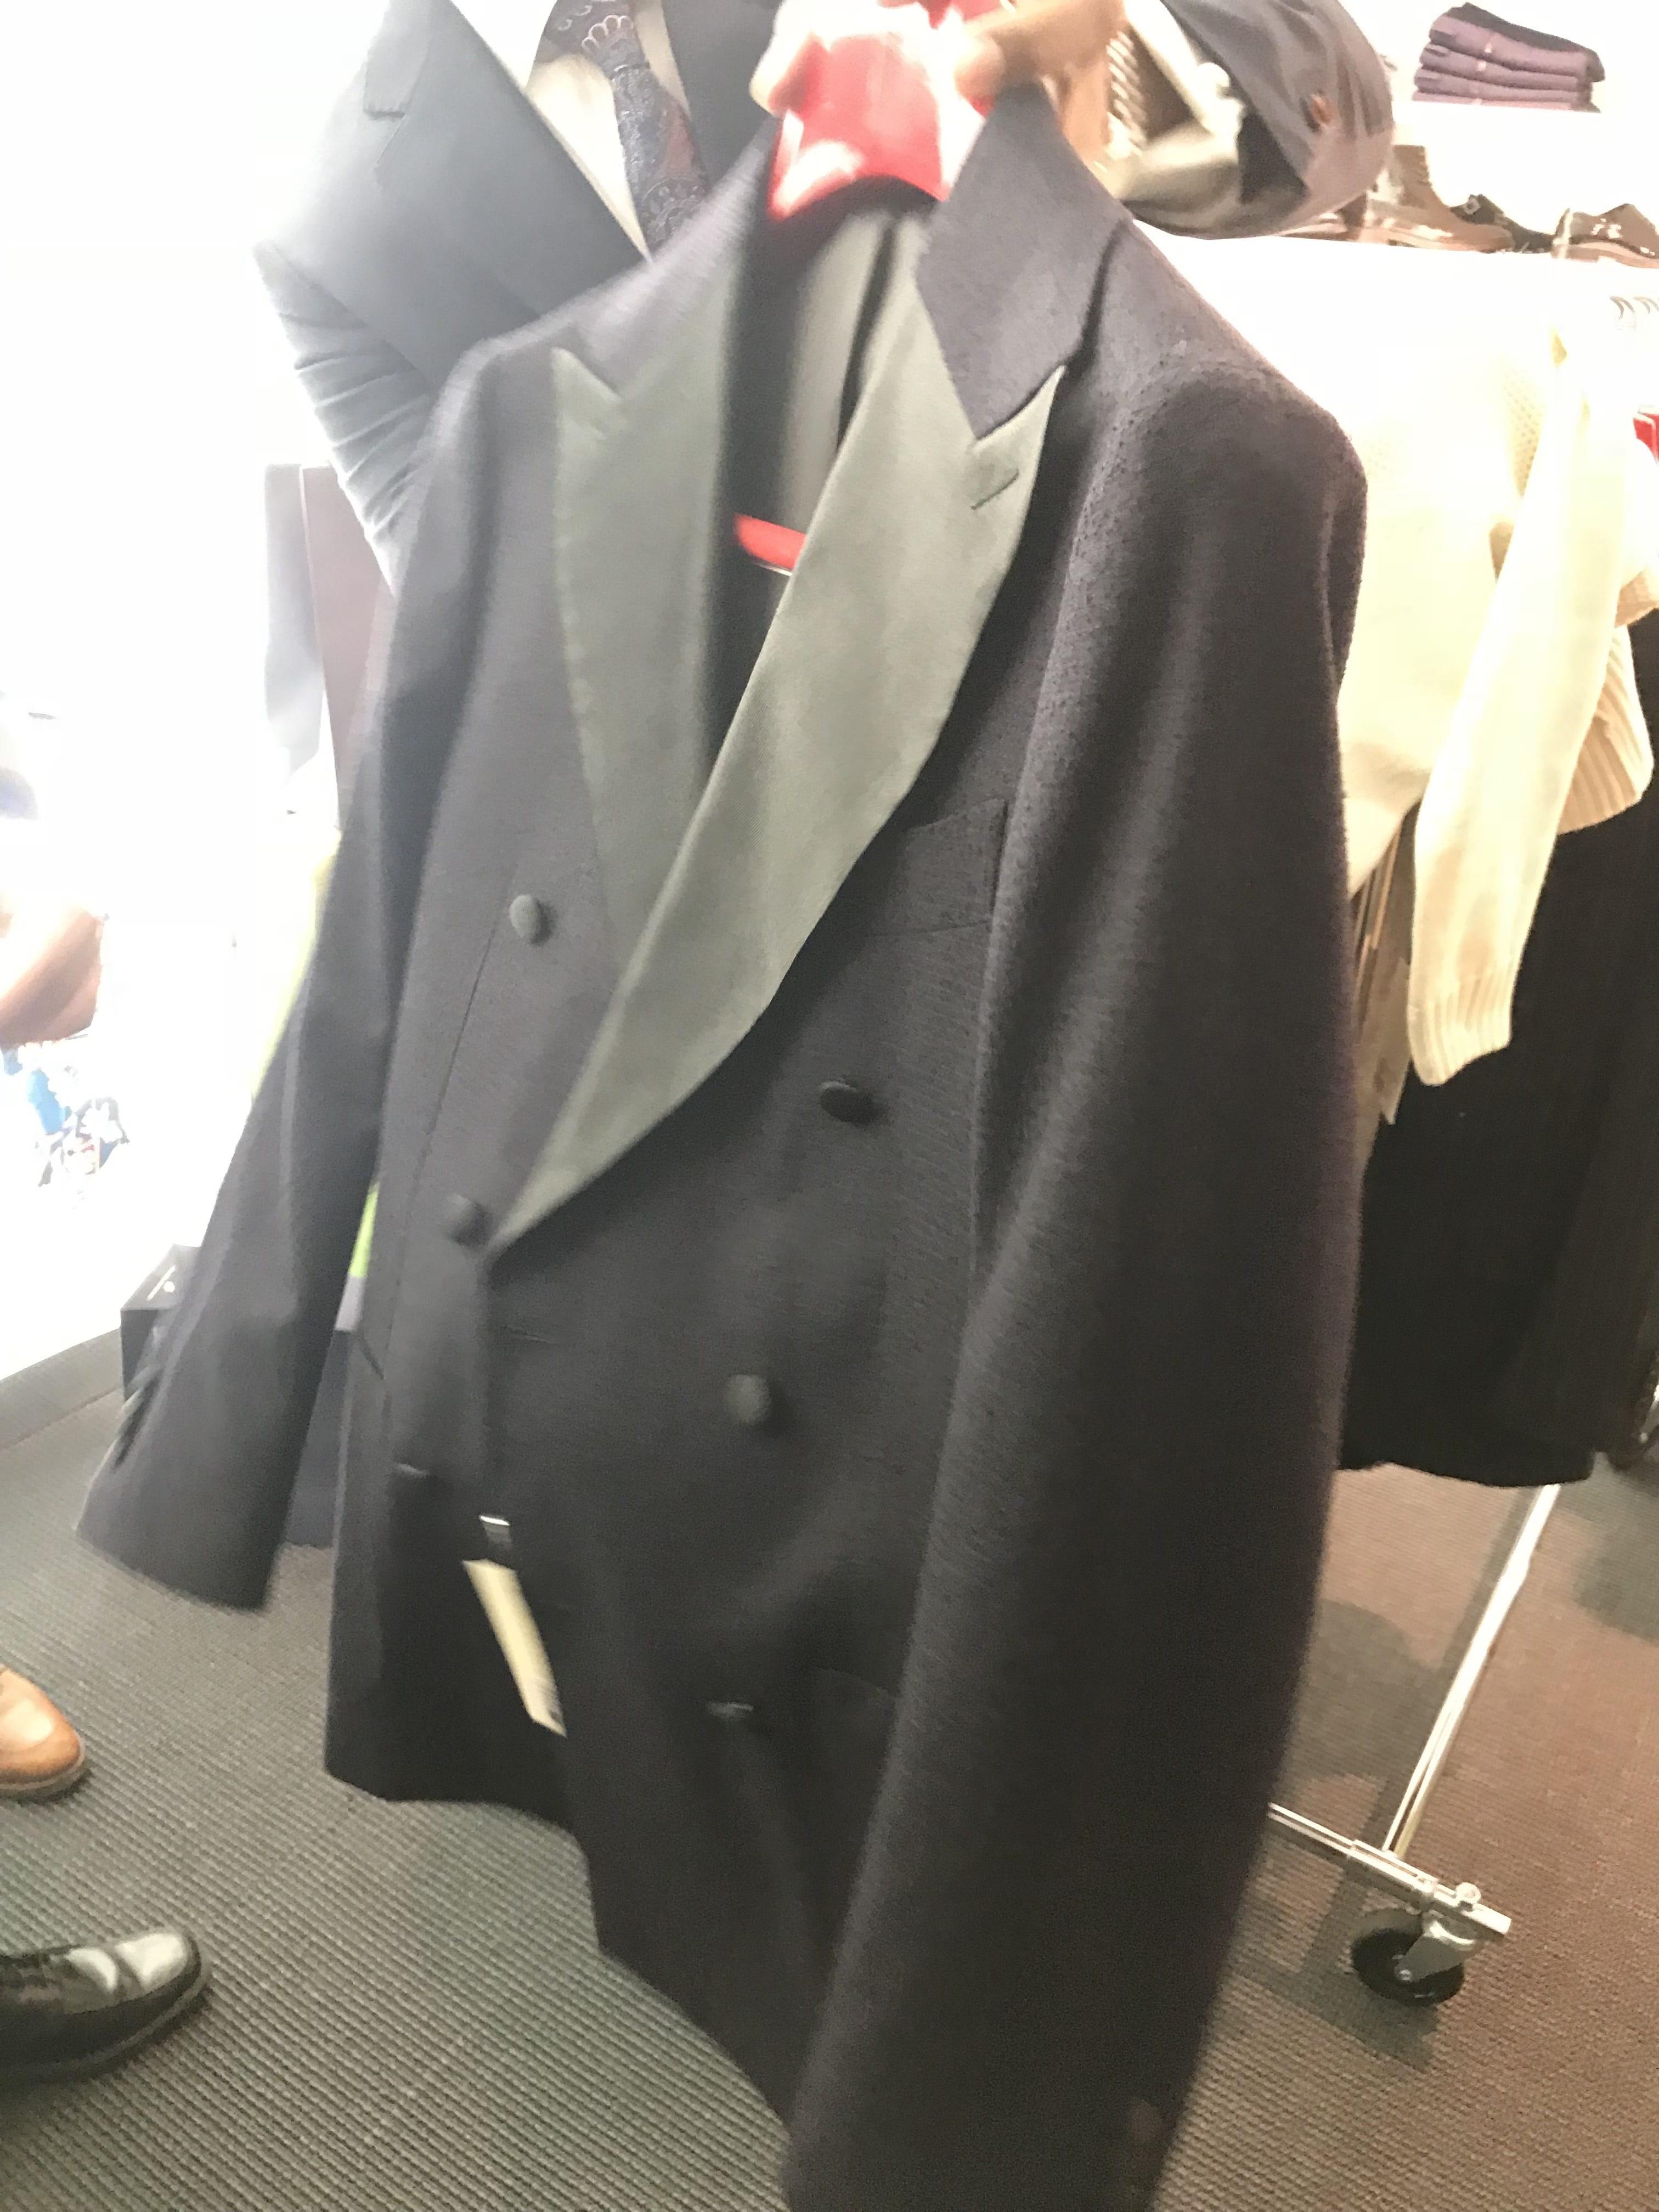 Men's Holiday Attire at SuitSupply, men's purple tuxedo